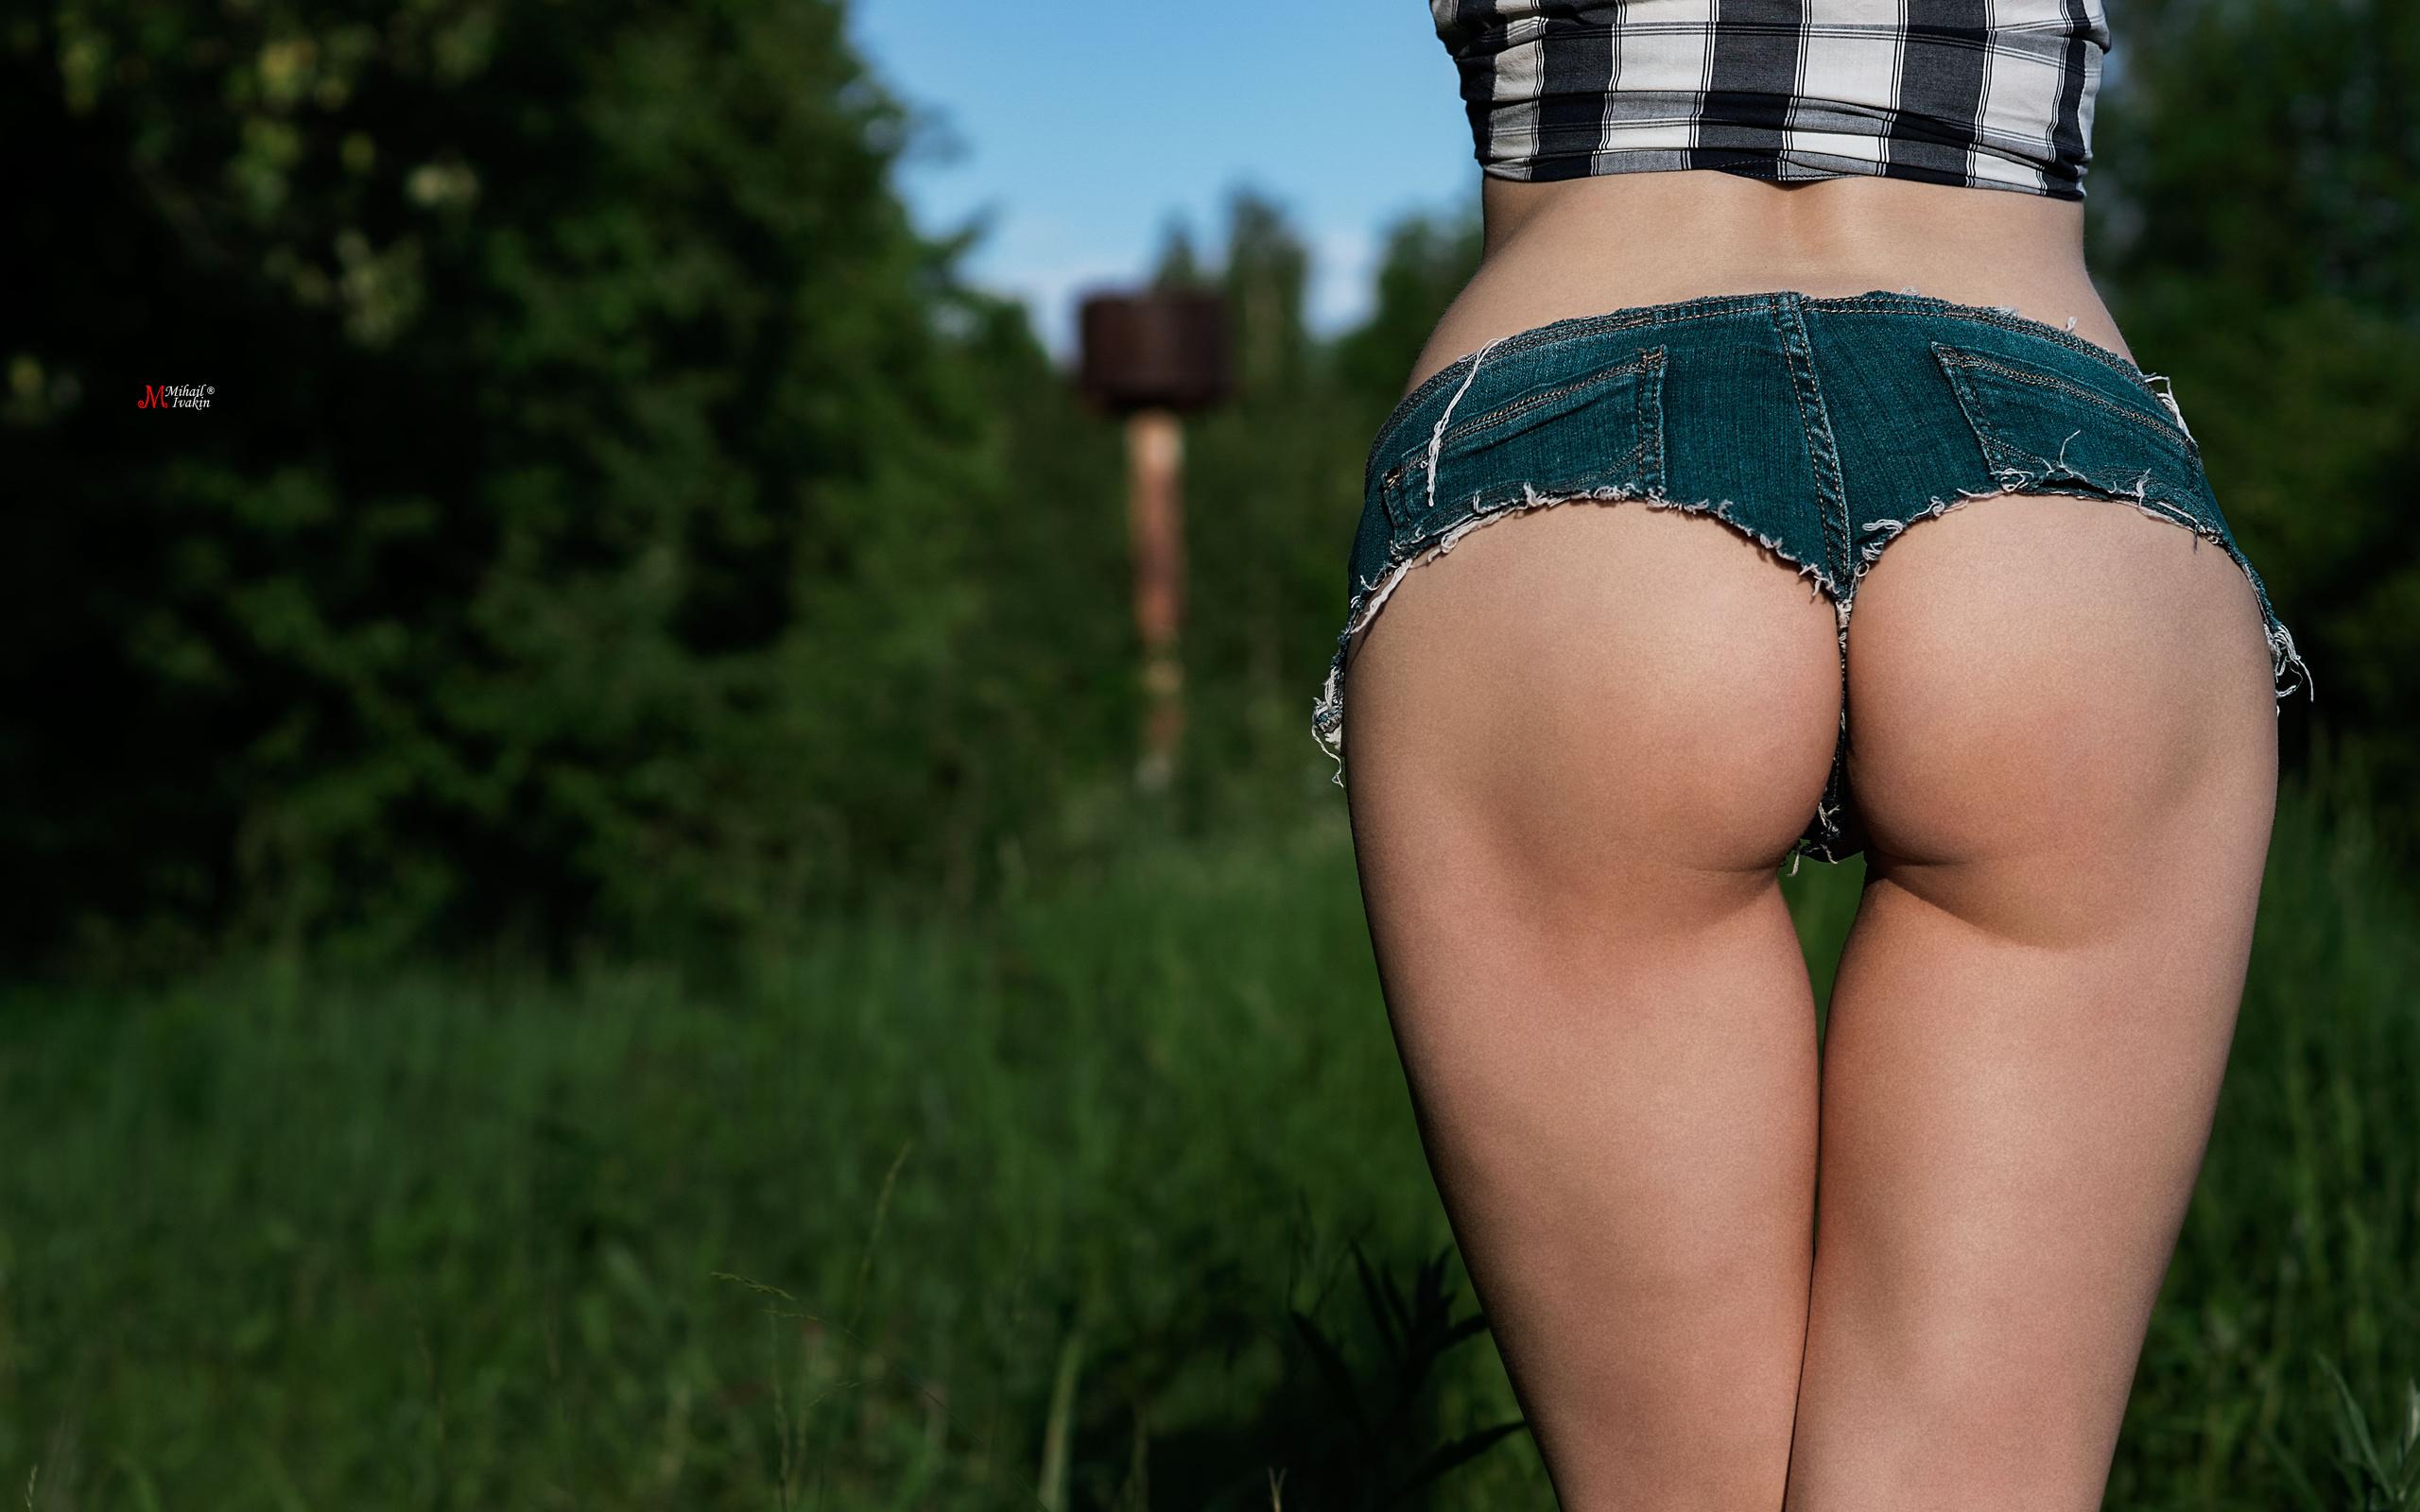 popi-v-krasivih-shortikah-porno-foto